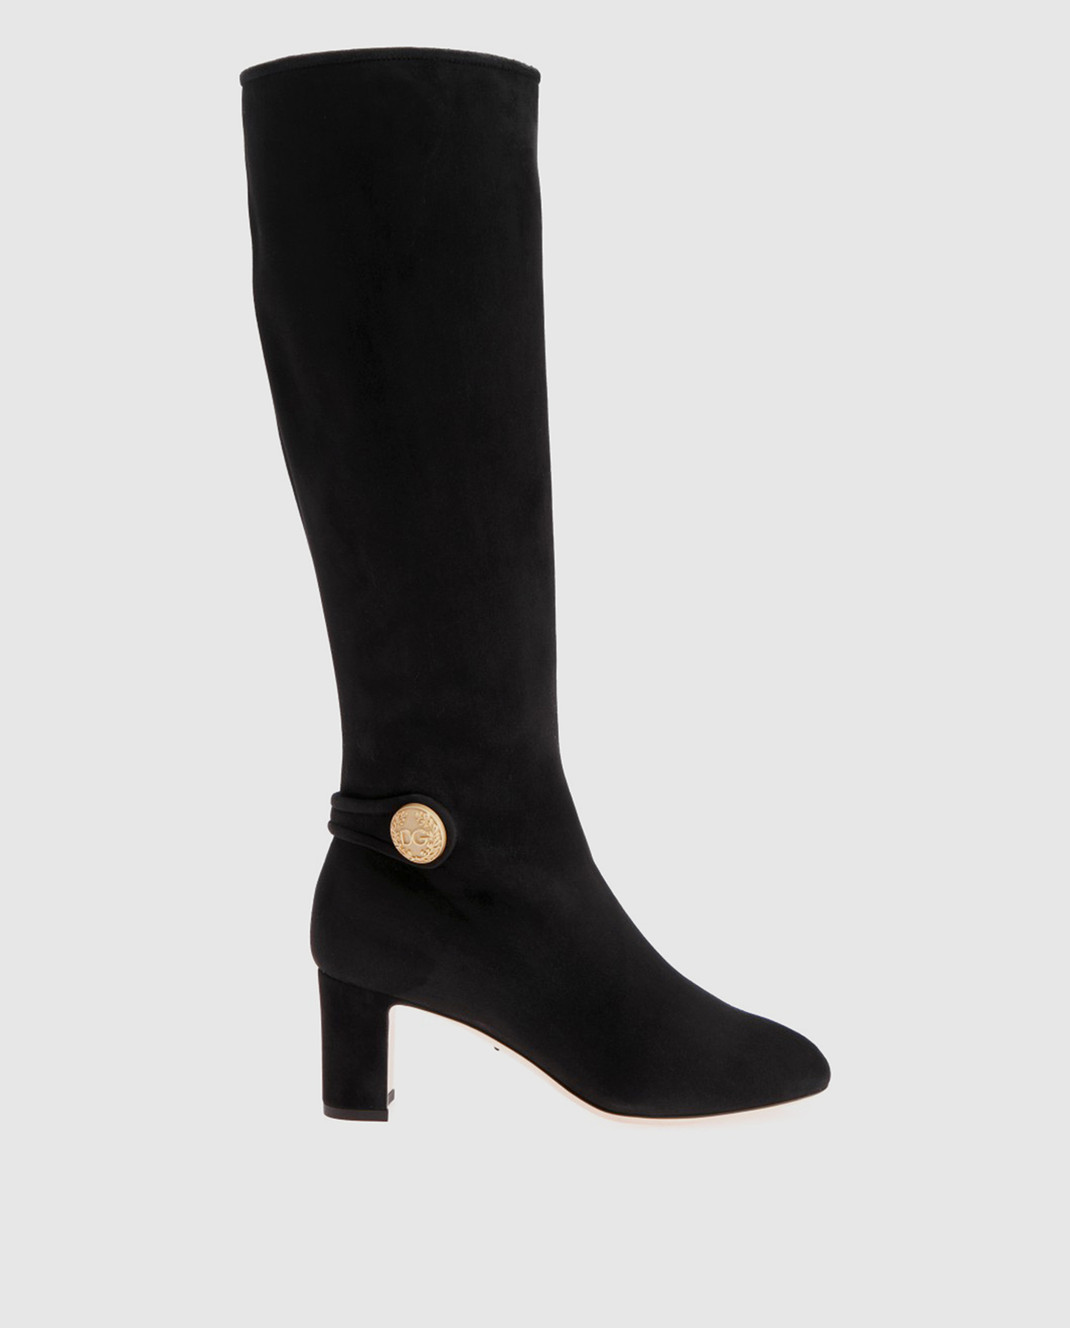 Dolce&Gabbana Черные замшевые сапоги CU0397A1275